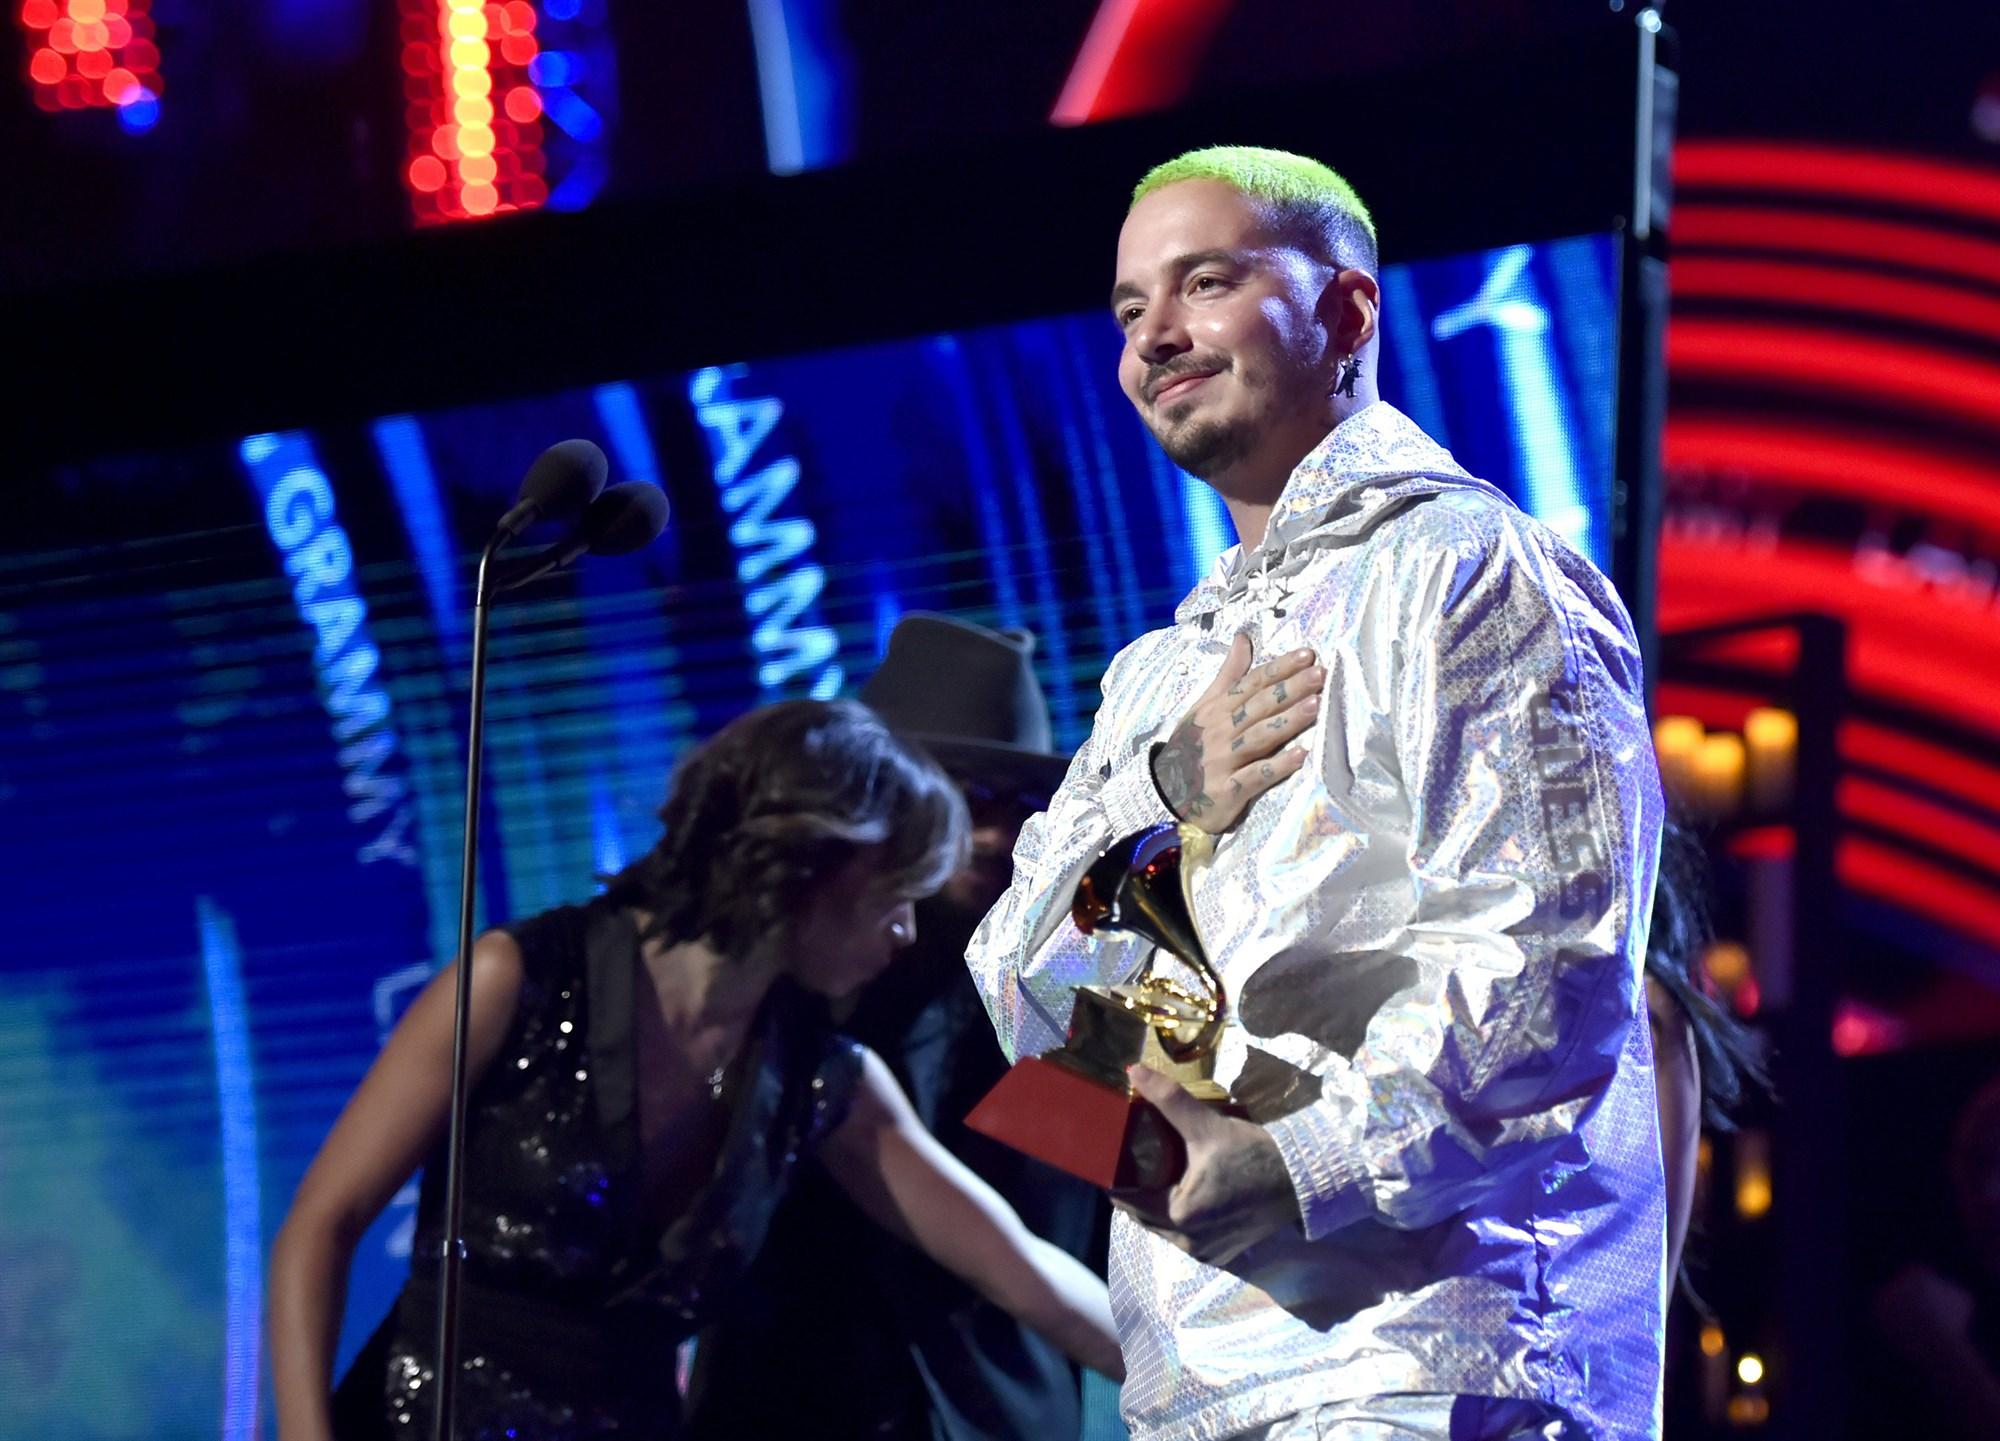 J Balvin Opens The Grammys